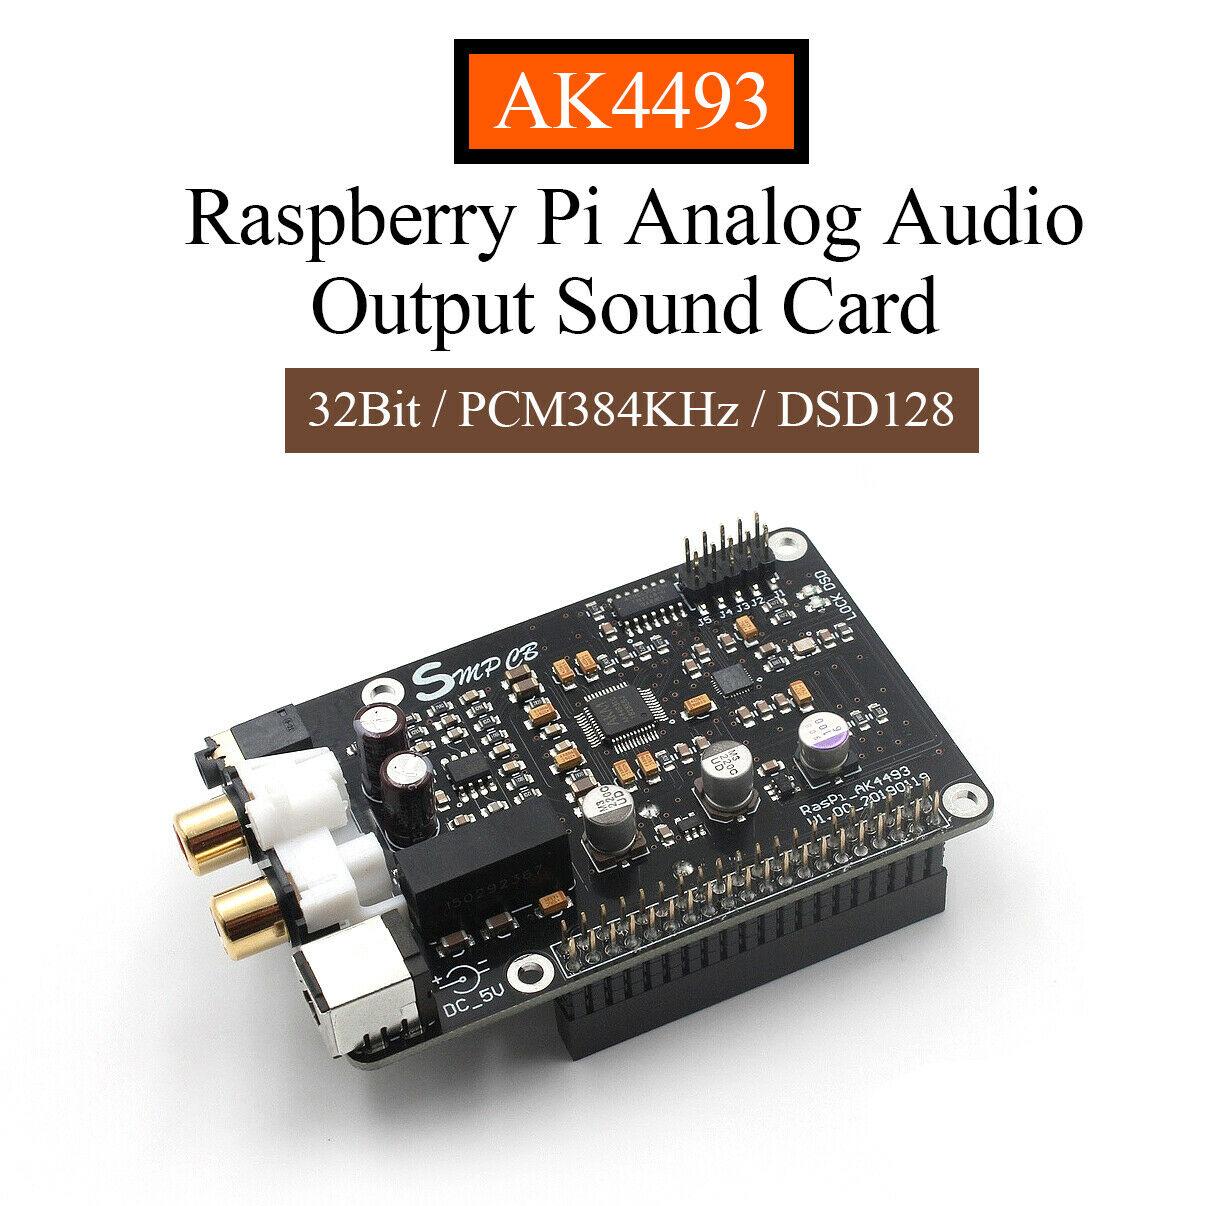 Nobsound Hi Fi AK4493 DAC Decoder Board for Raspberry Pi Digital Player 32Bit PCM384KHz DSD128